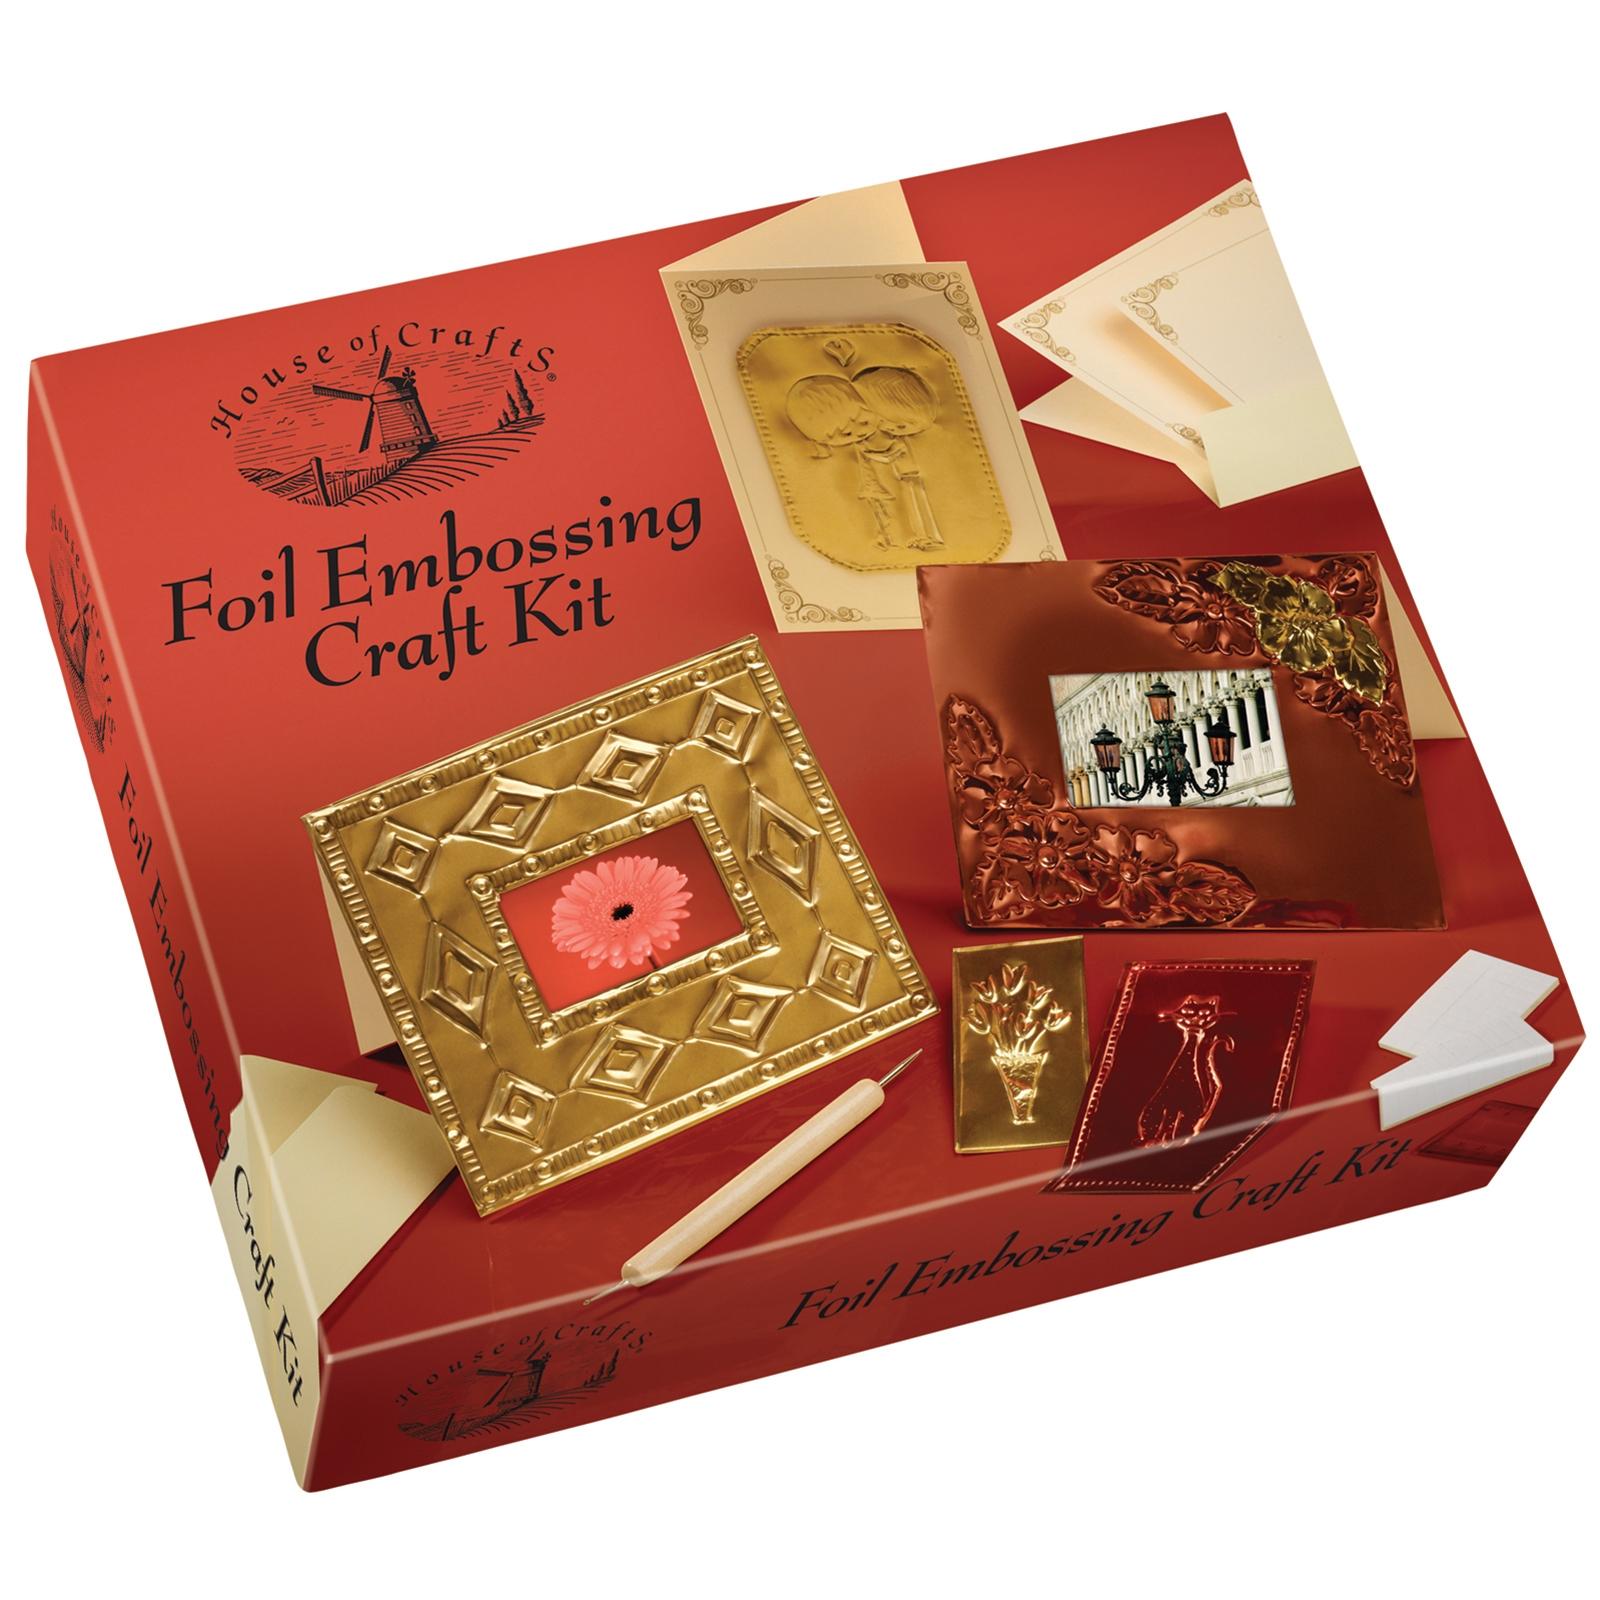 Foil Embossing Craft Kit